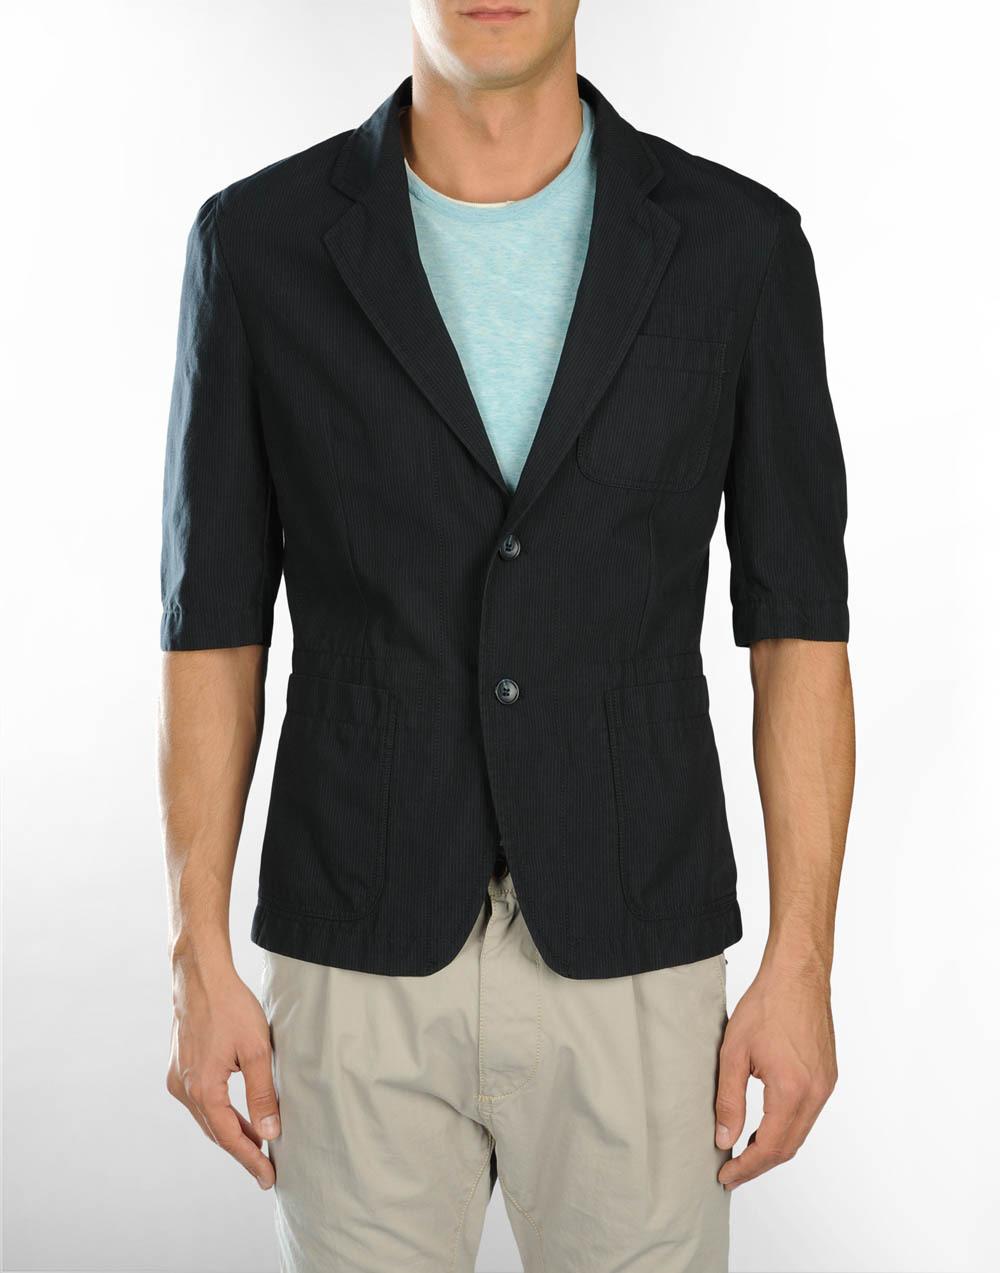 Mens jacket half - Workwear Jacket Half Sleeve Mens Formal Jacket